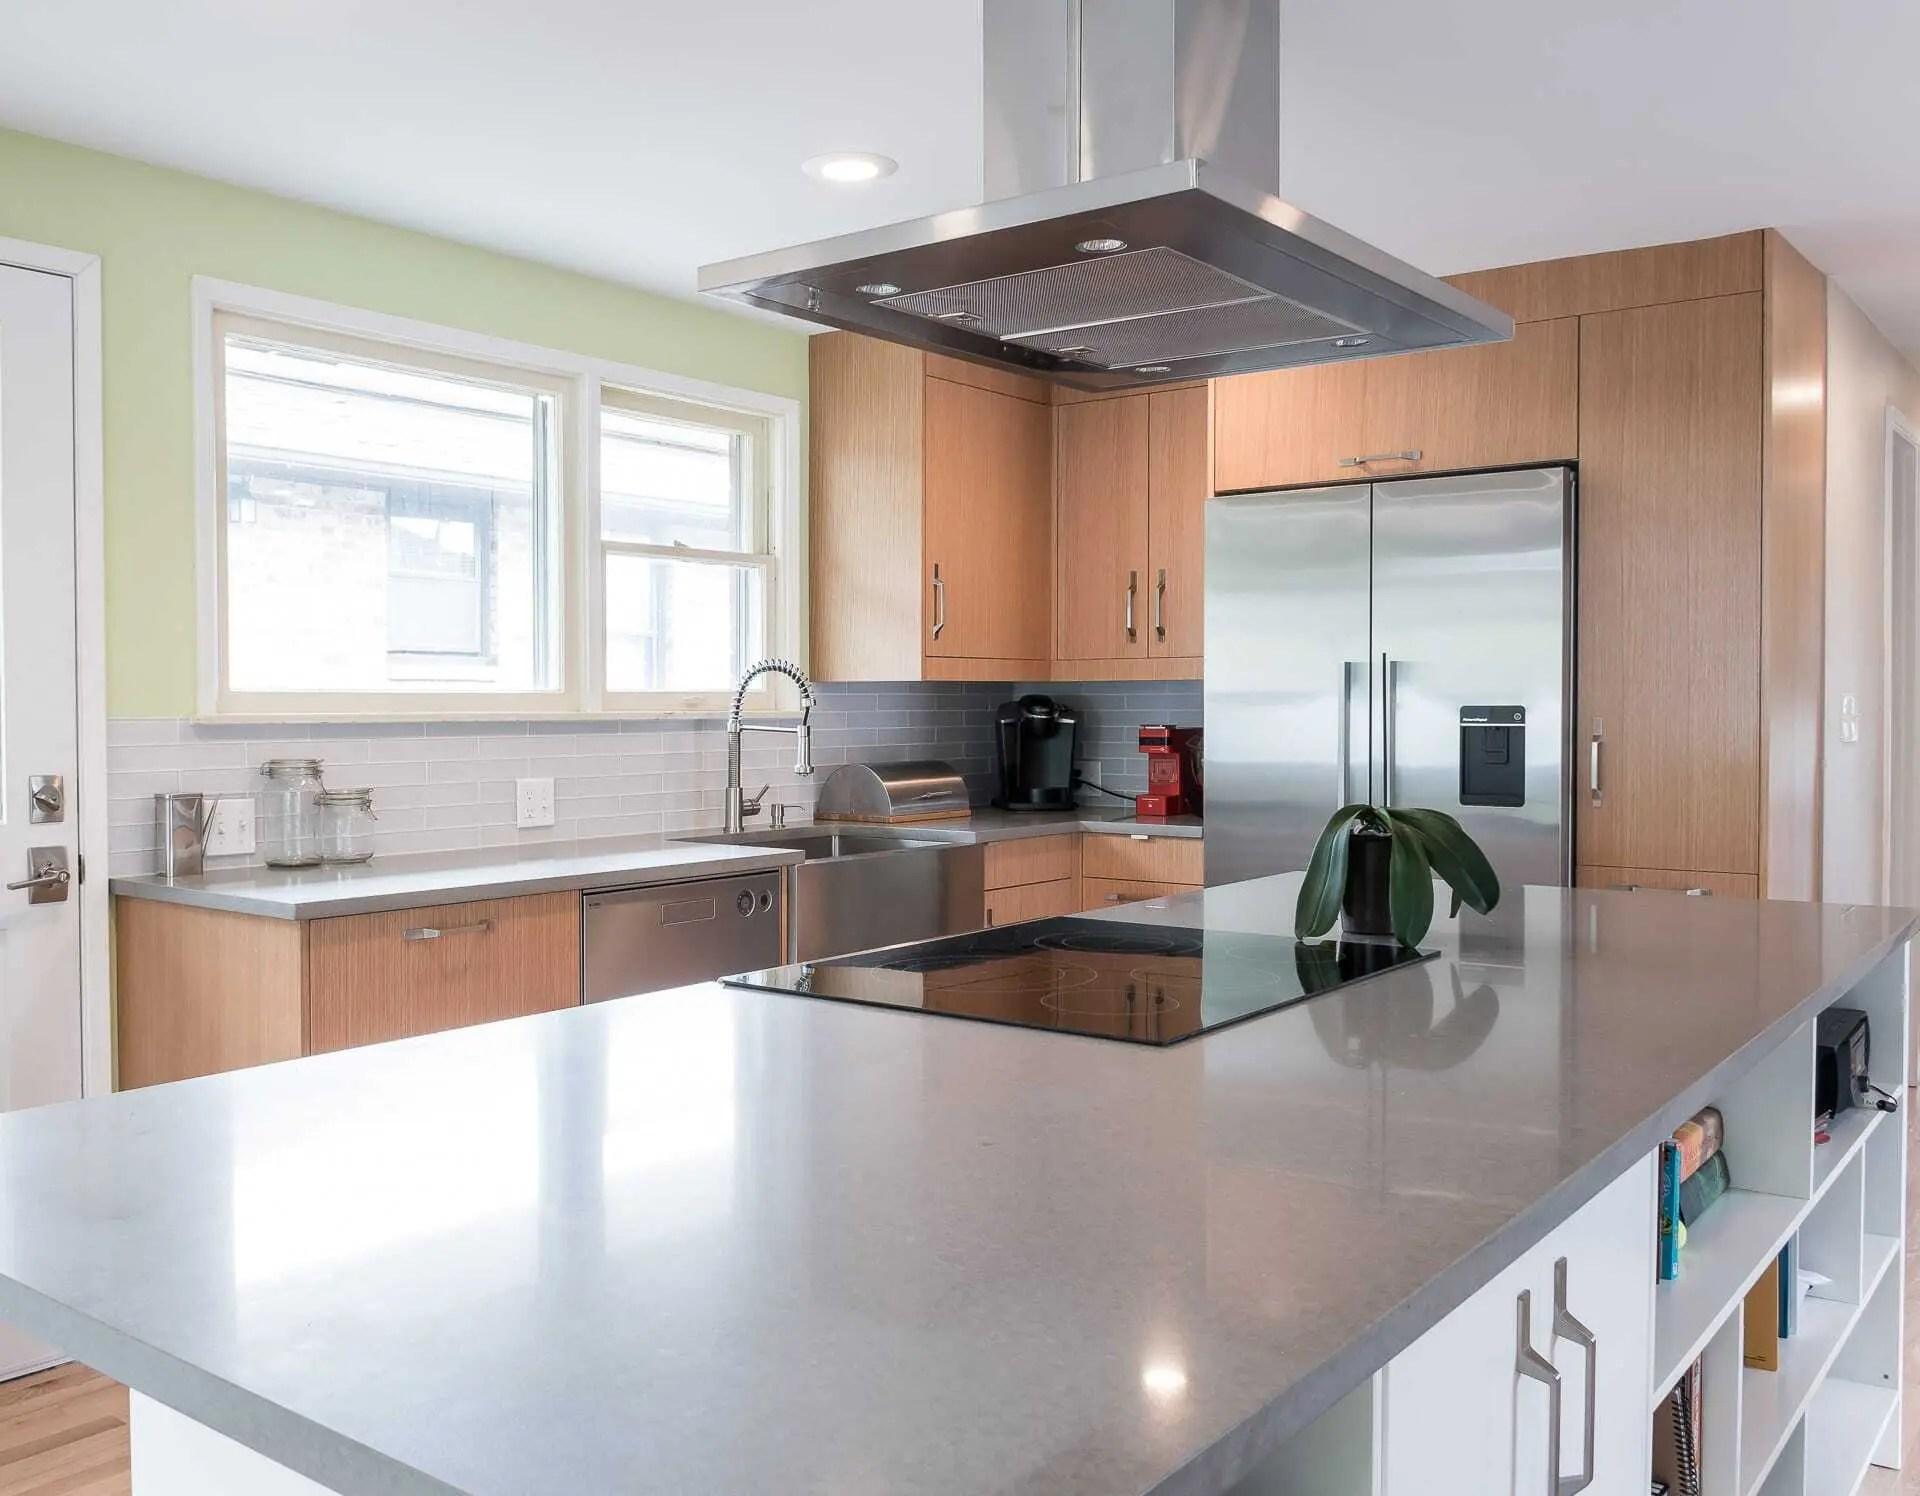 Ikea Akurum Kitchen Cabinets An Ikea Kitchen That Doesnt Look Like Ikea Nw Homeworks